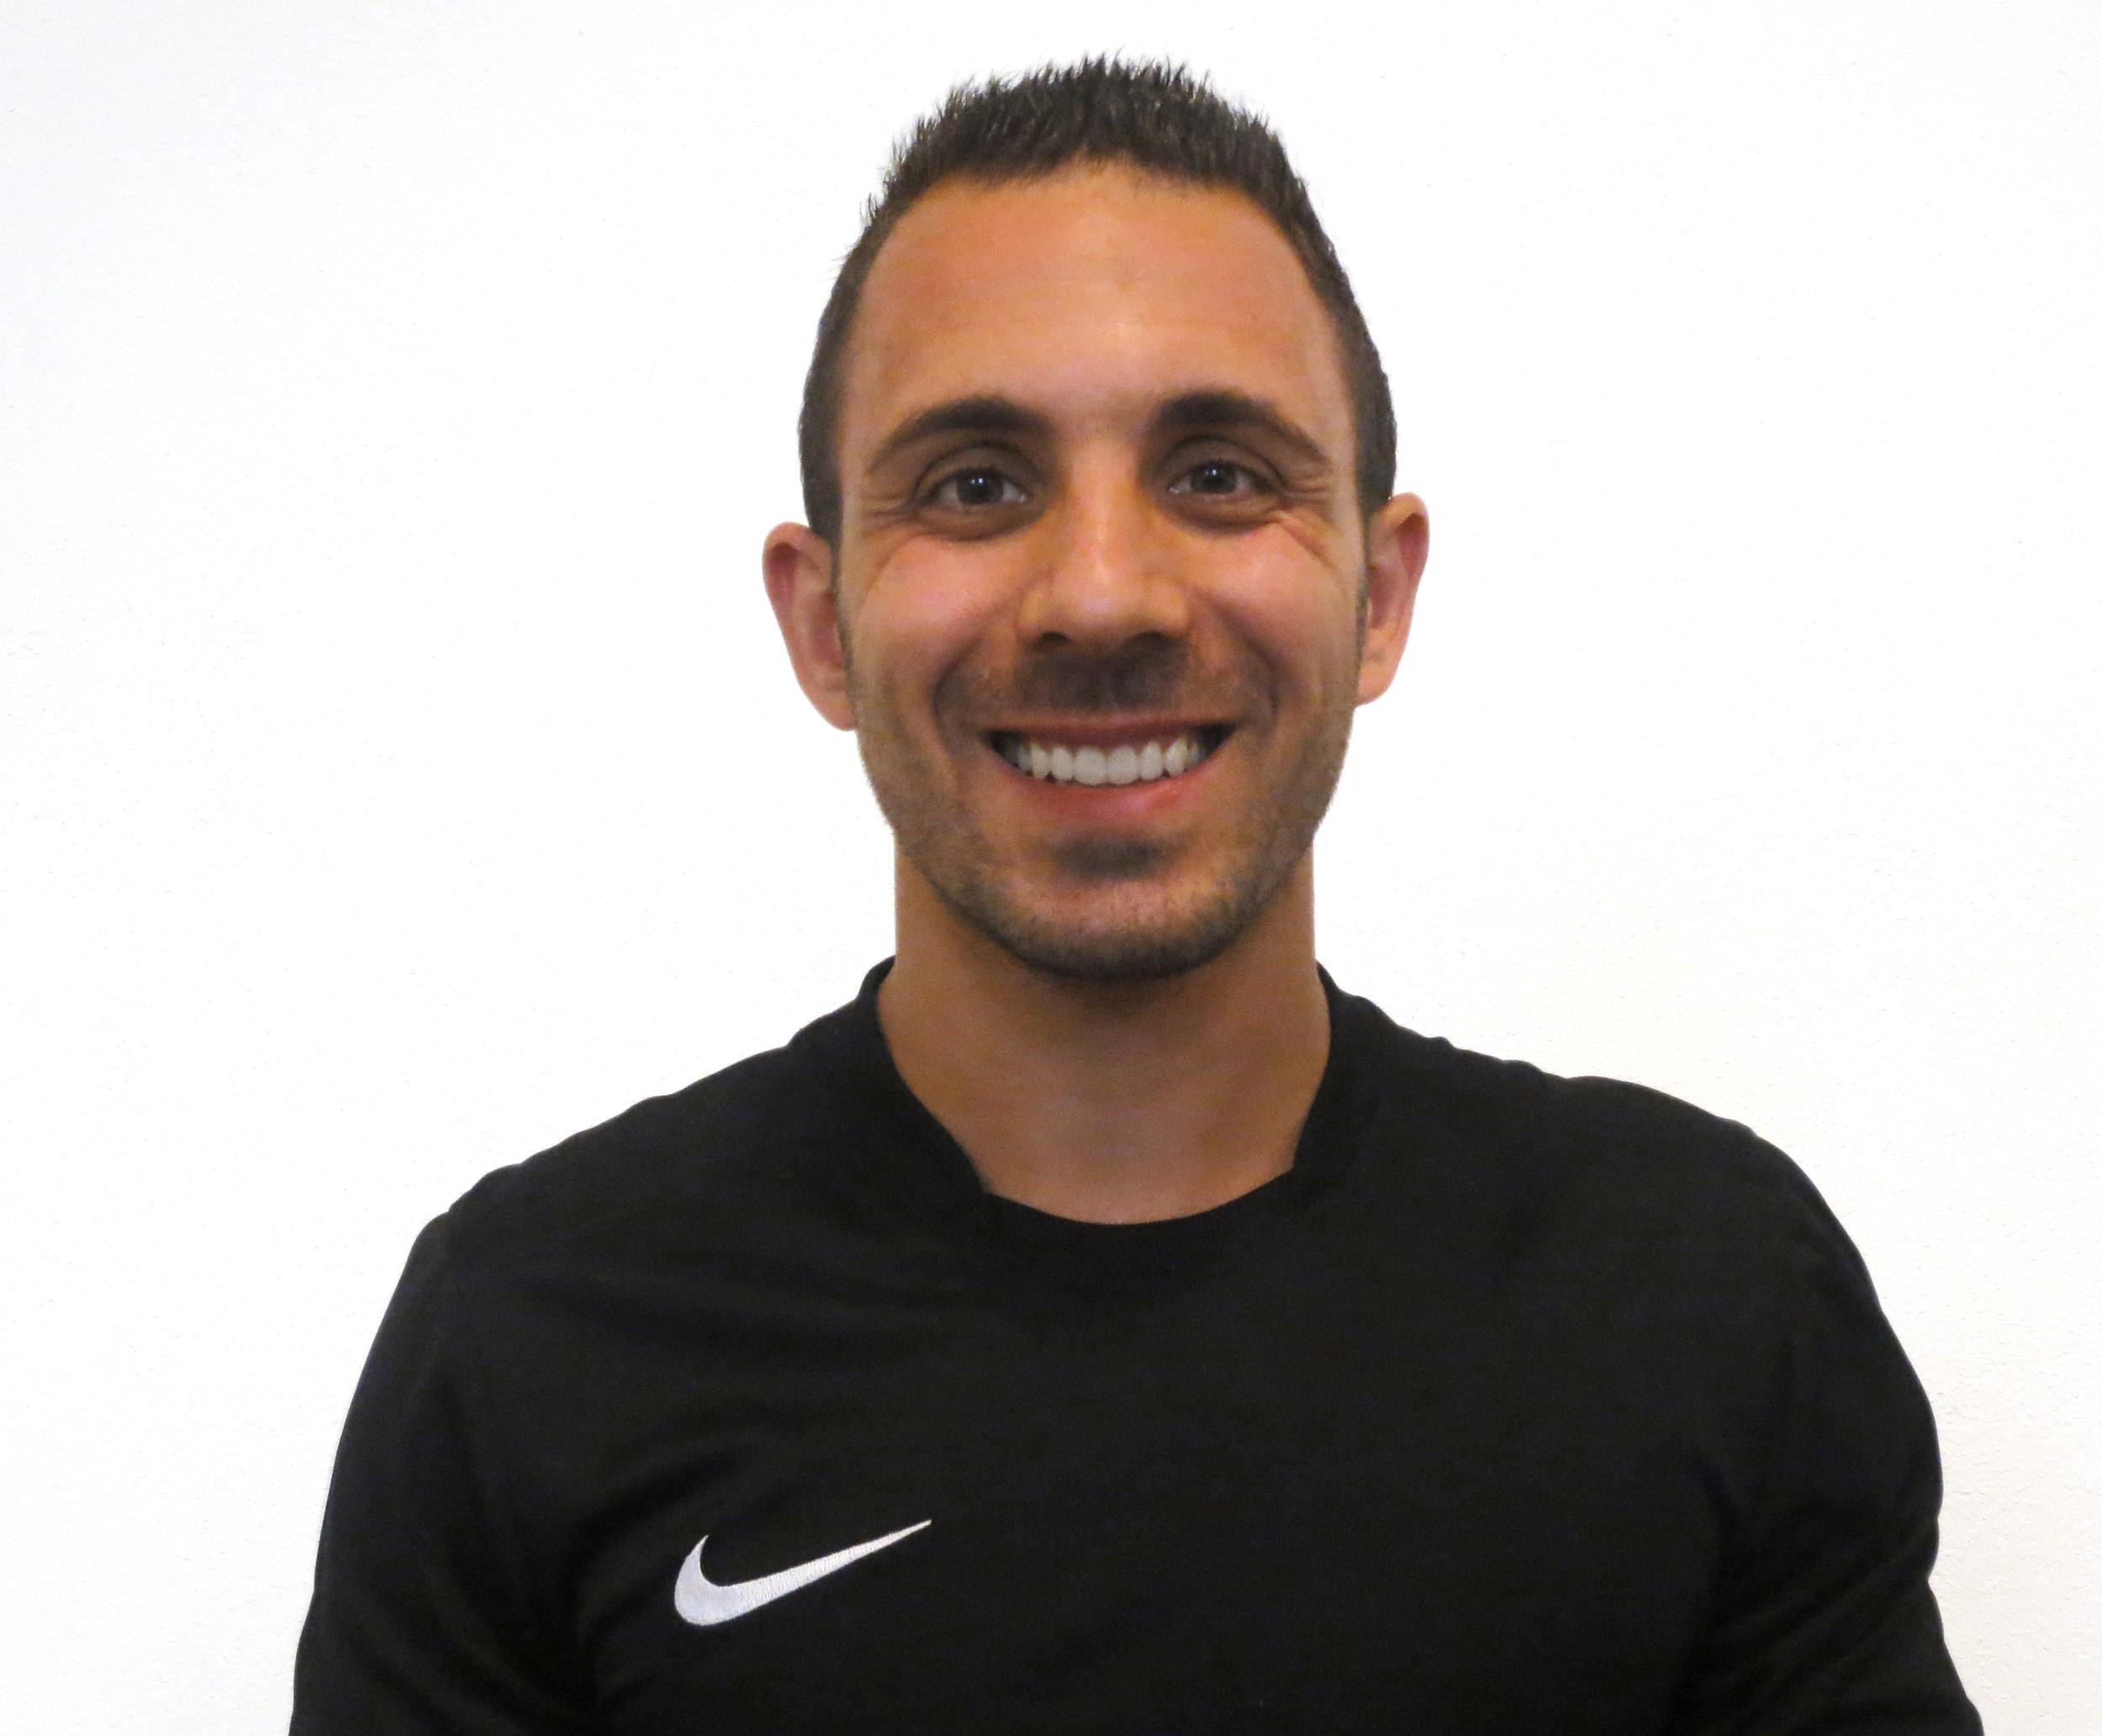 Personal Trainer Martin Heller